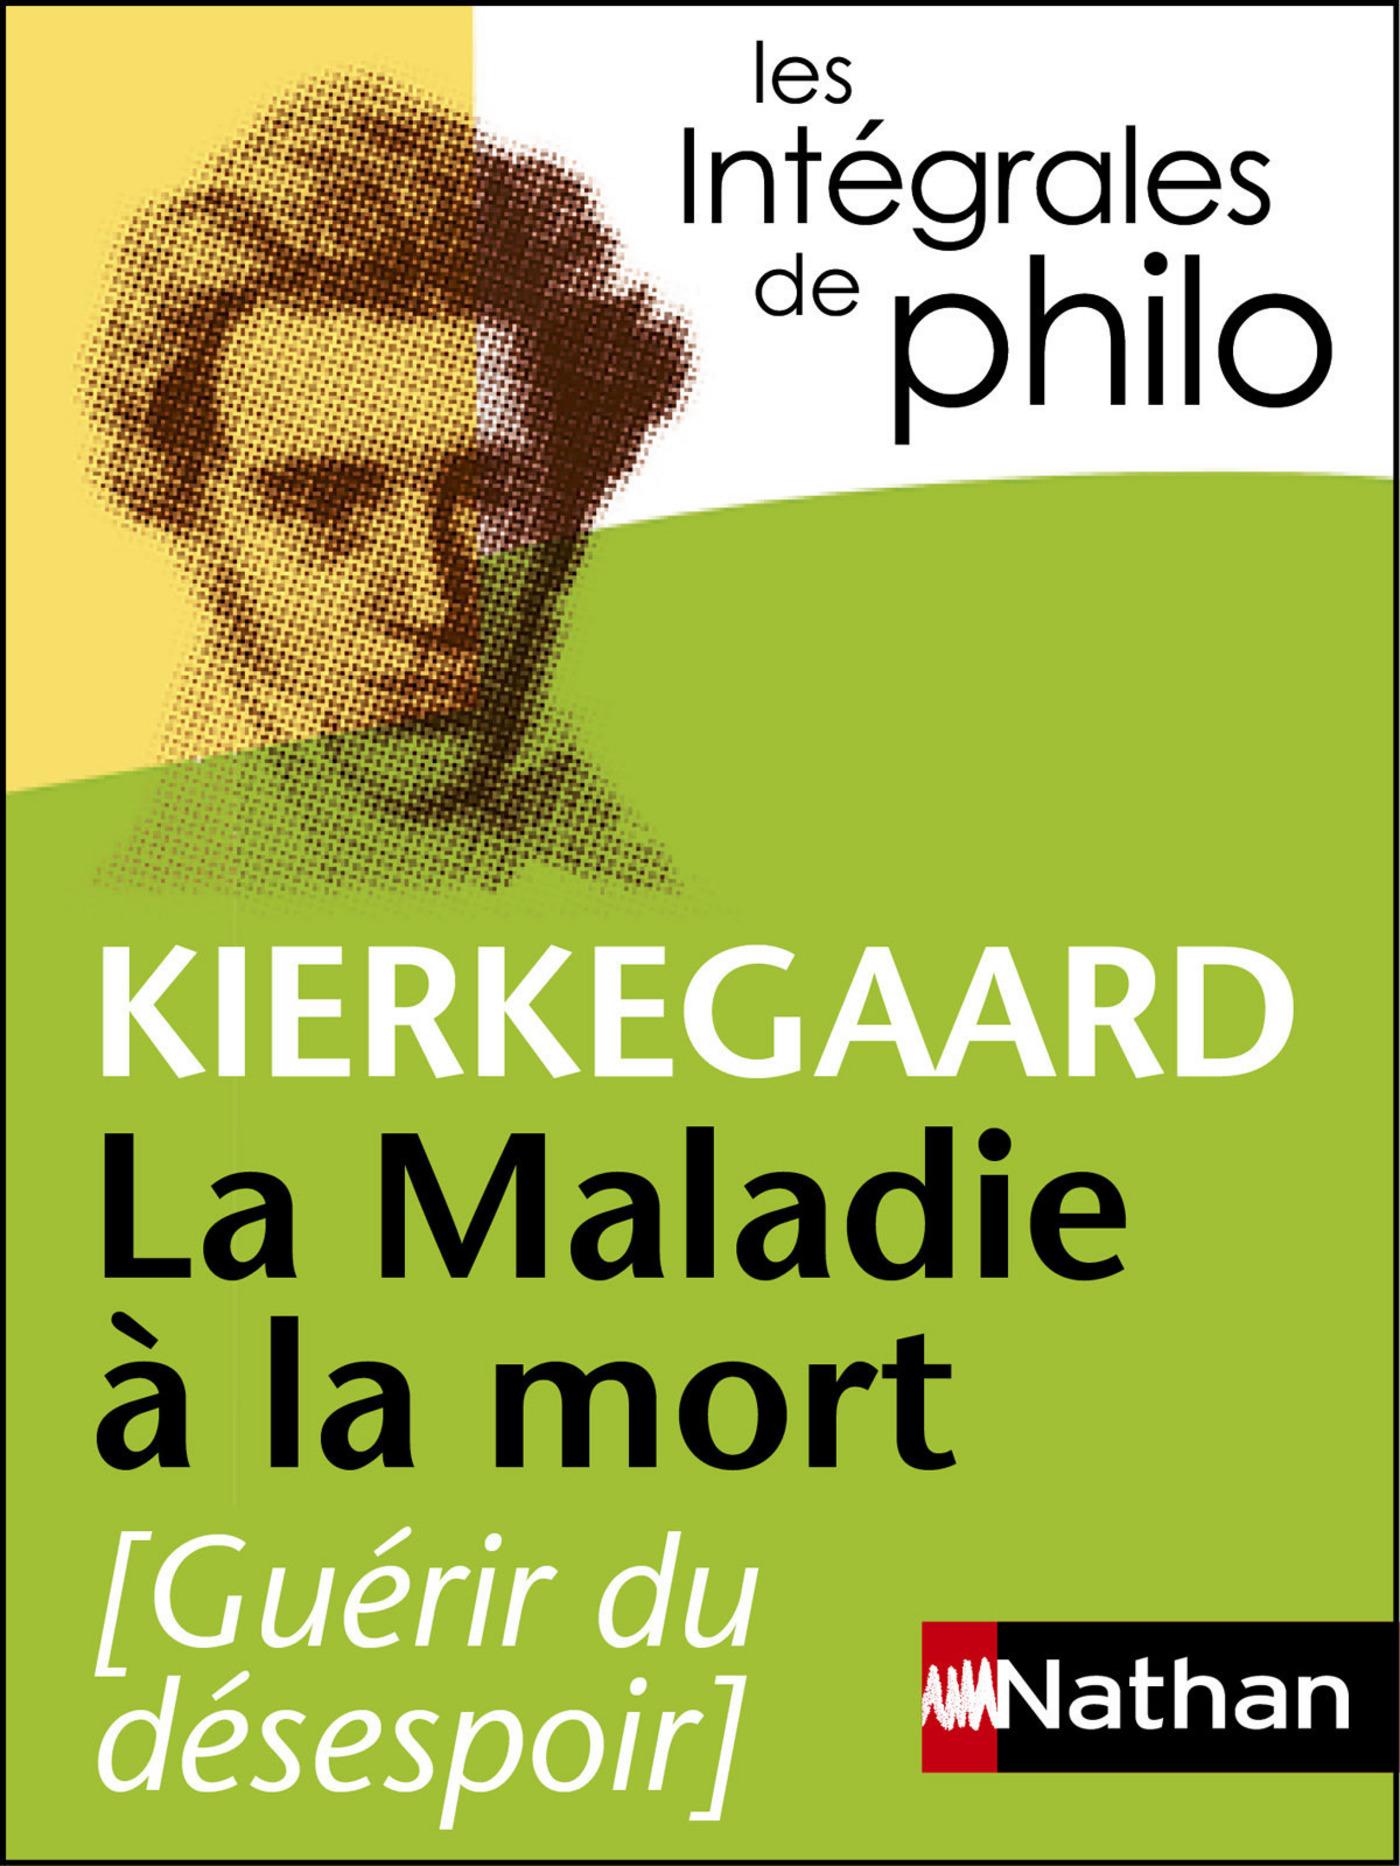 Intégrales de Philo, KIERKEGAARD, La Maladie à la mort